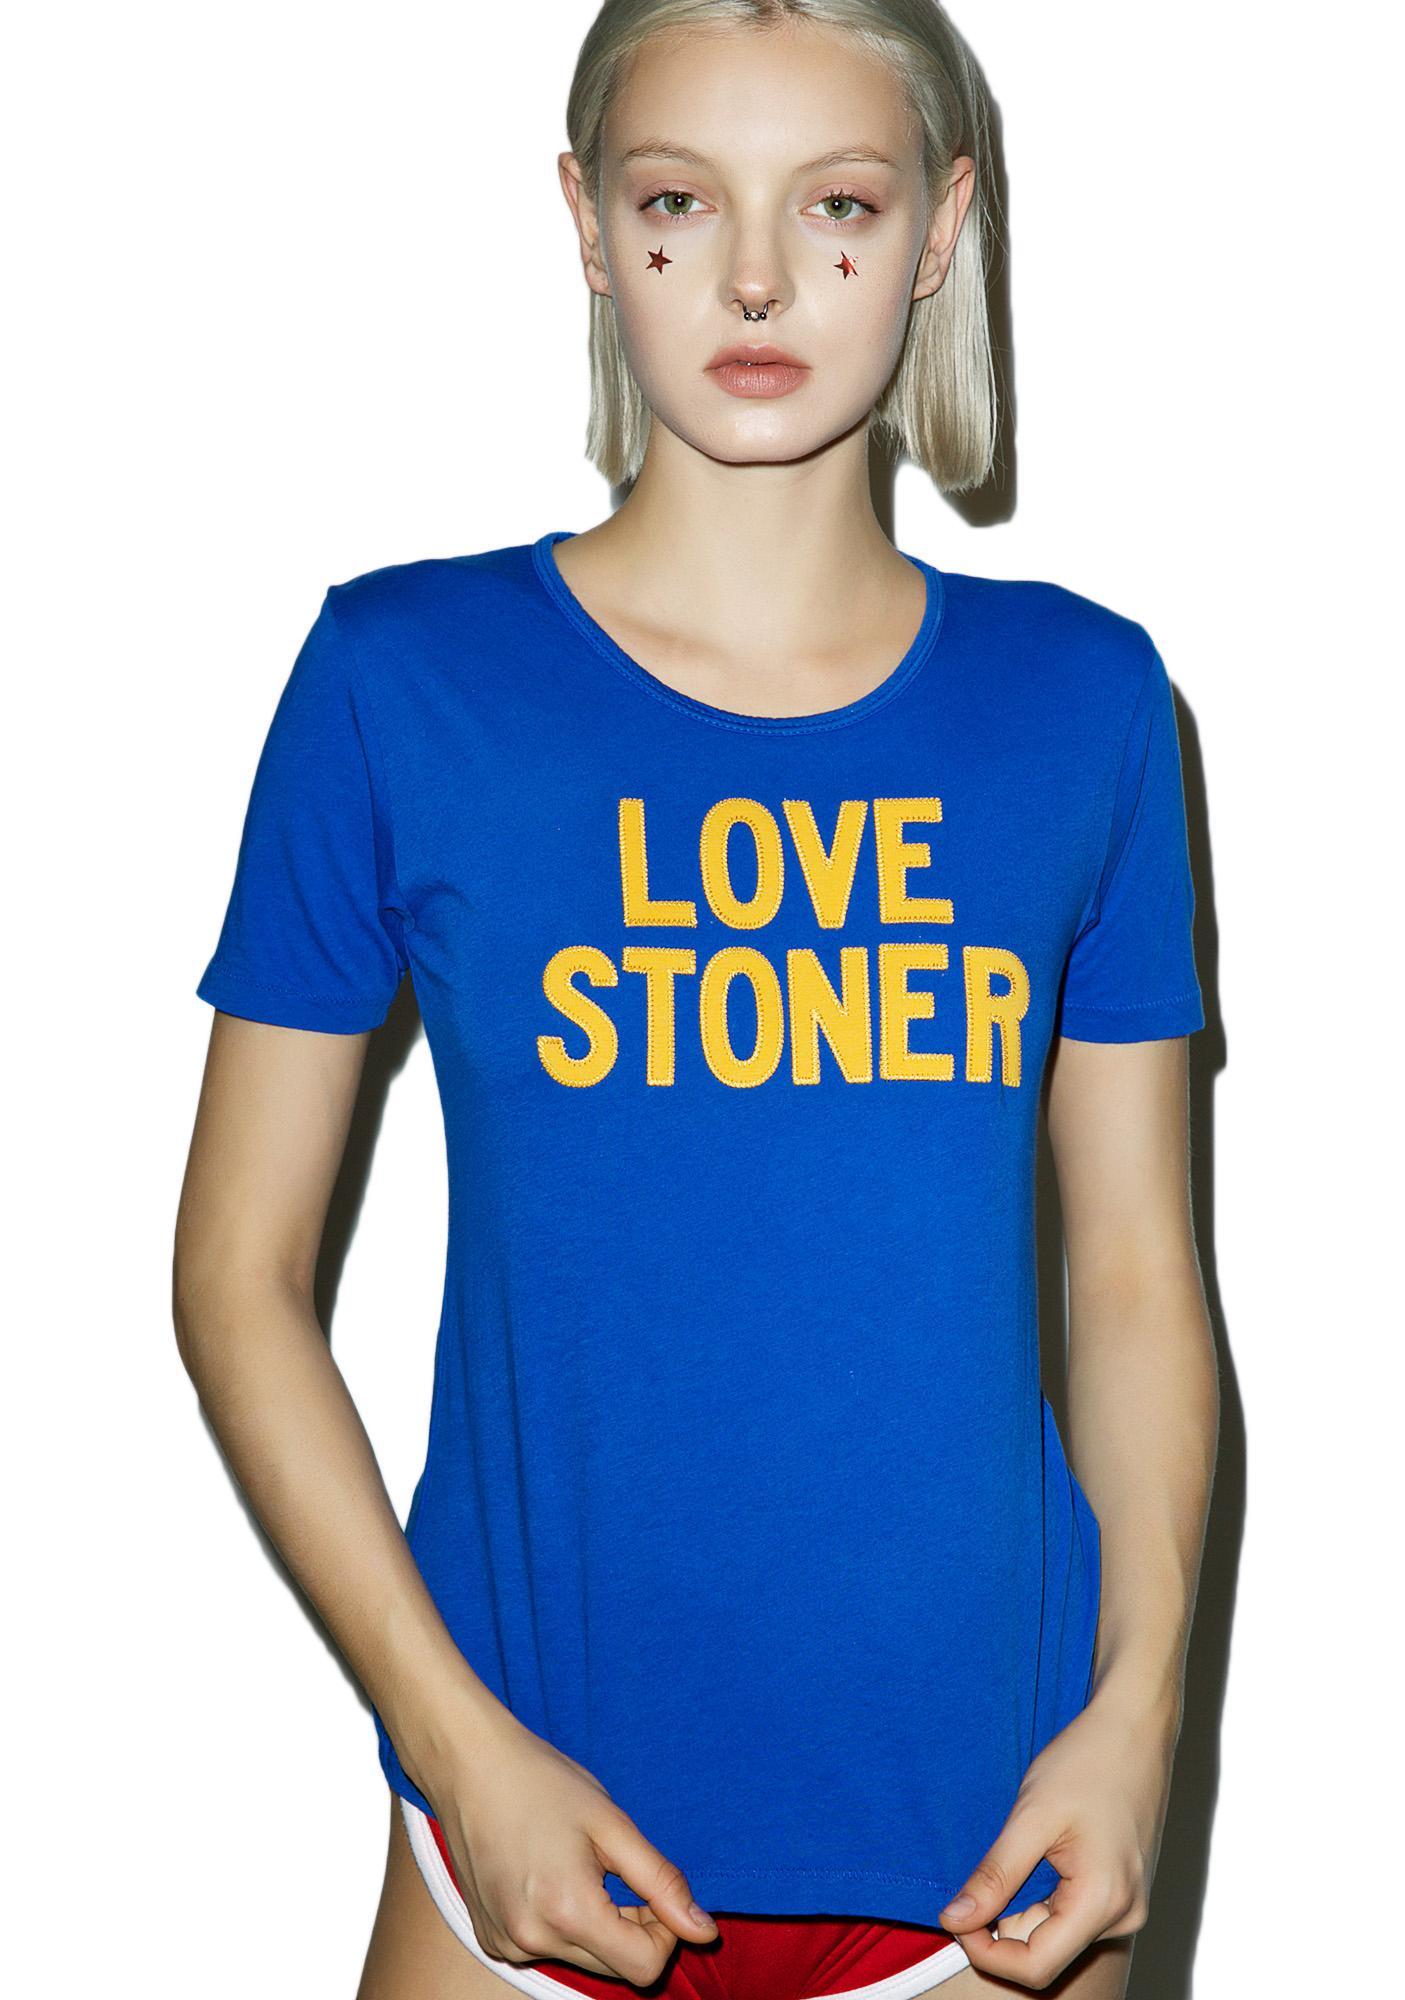 Sugarhigh + Lovestoned Love Stoner Tee